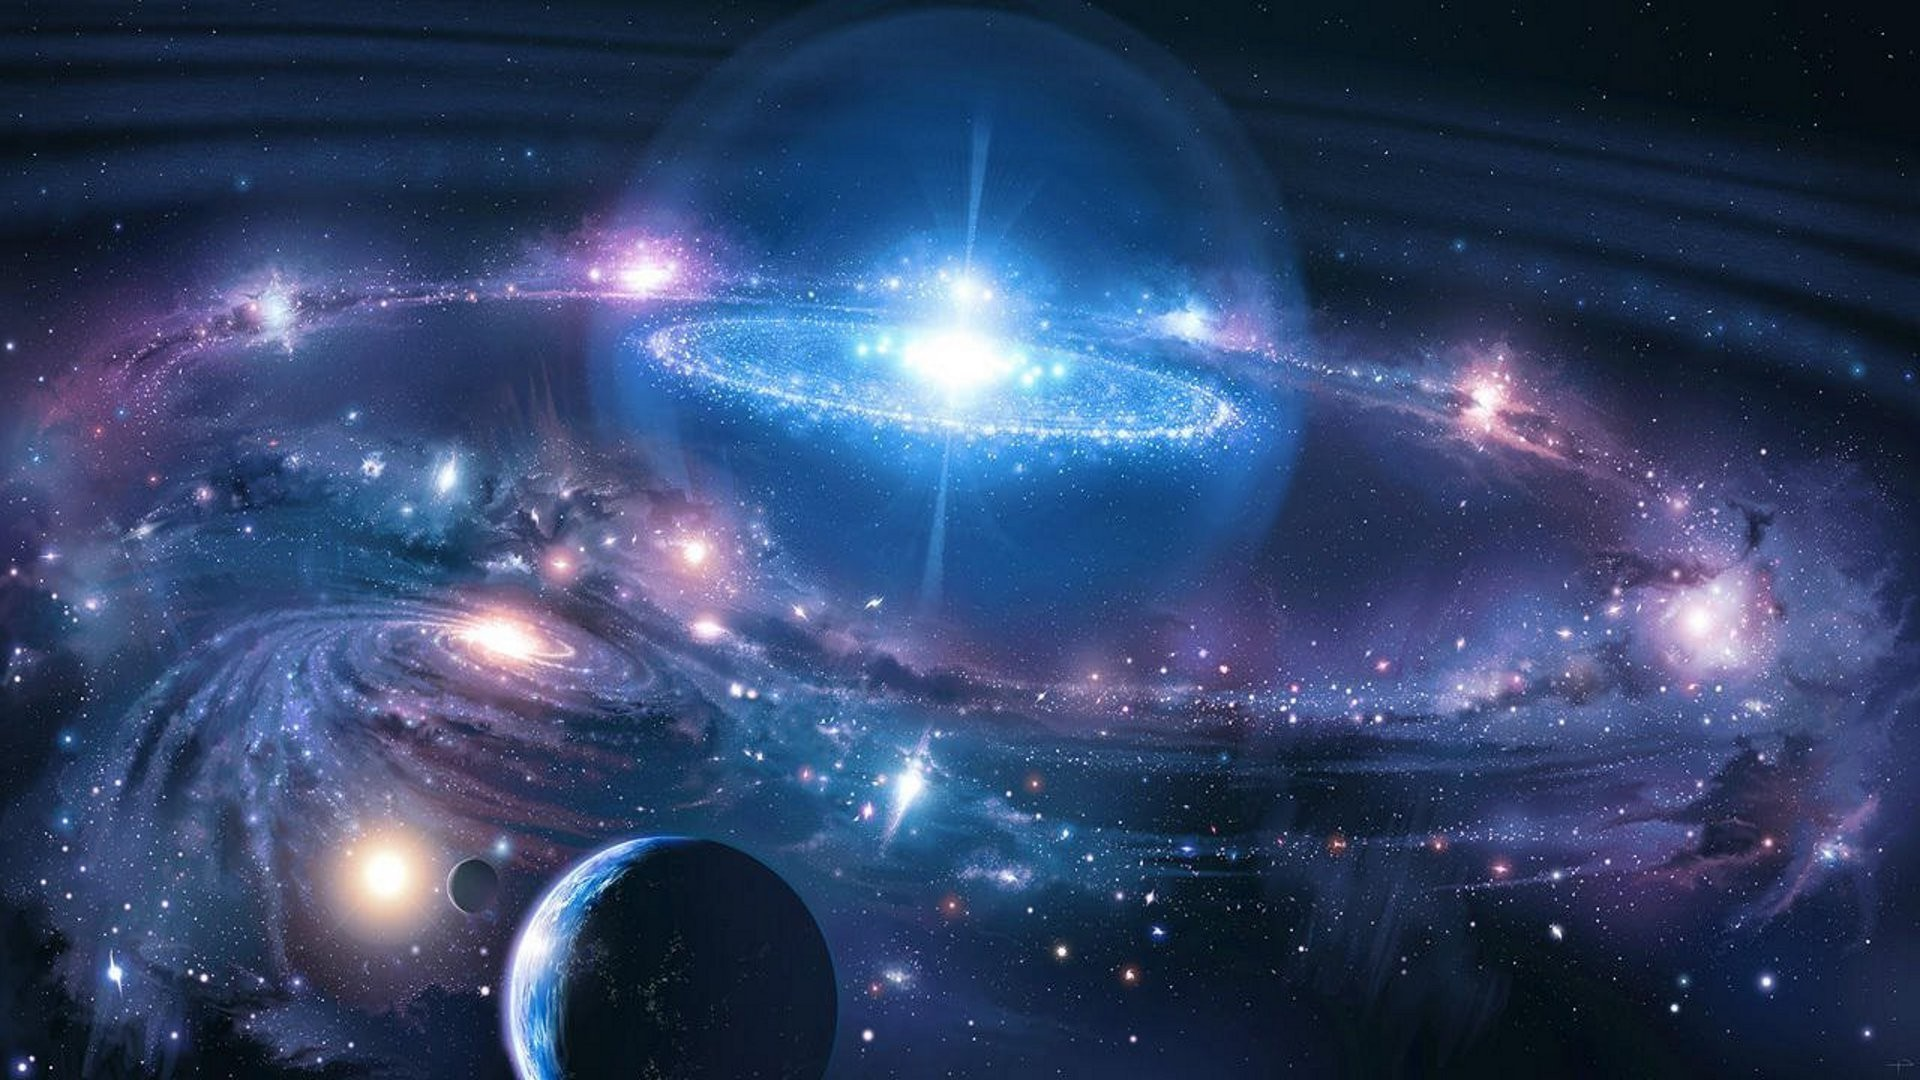 Sparkling blue universe wallpaper 5222 1920x1080